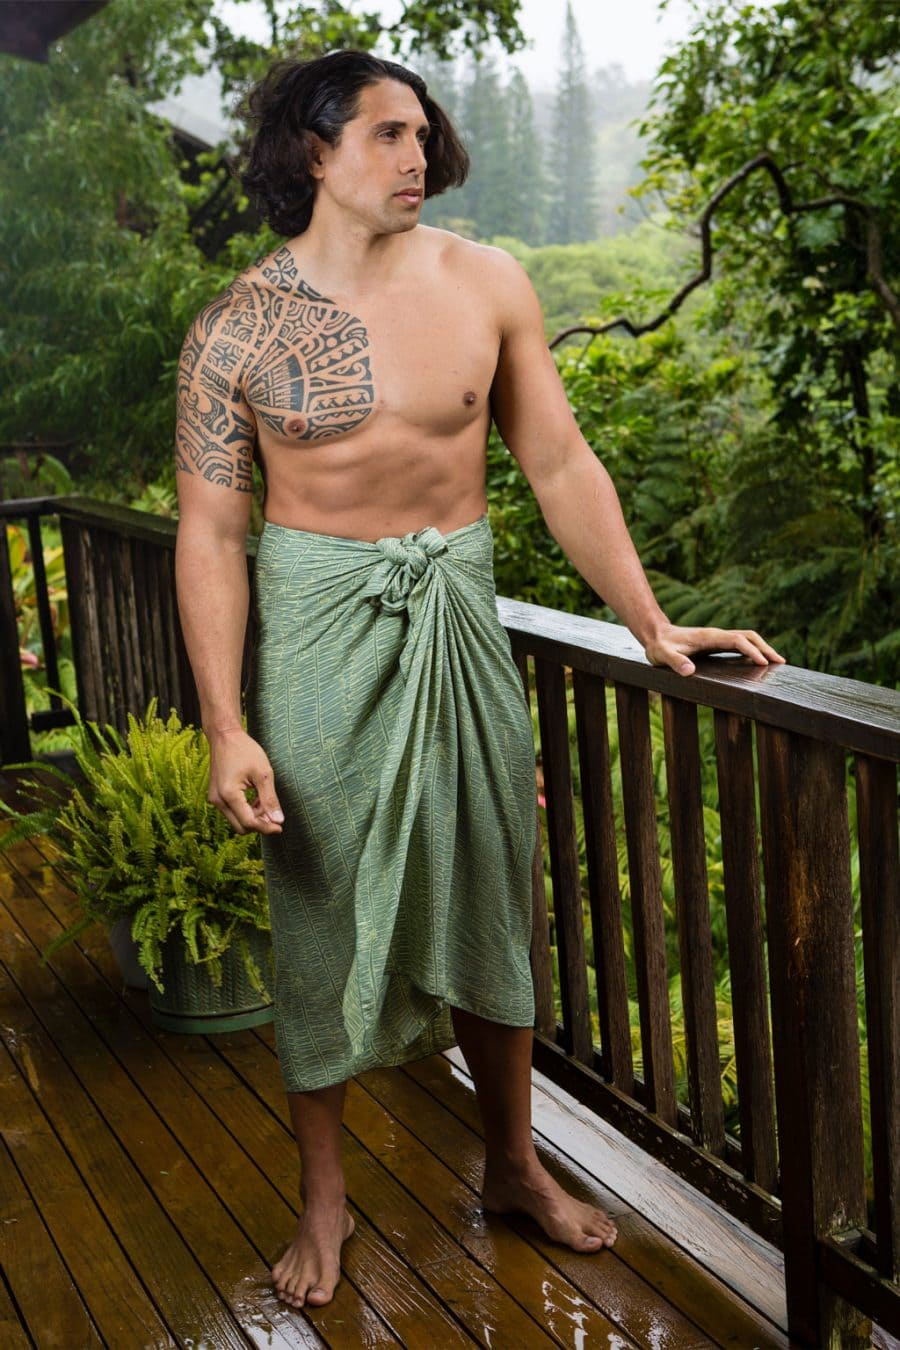 Male model wearing Lily Pad Margarita Pareo wrap in Kupukupu pattern